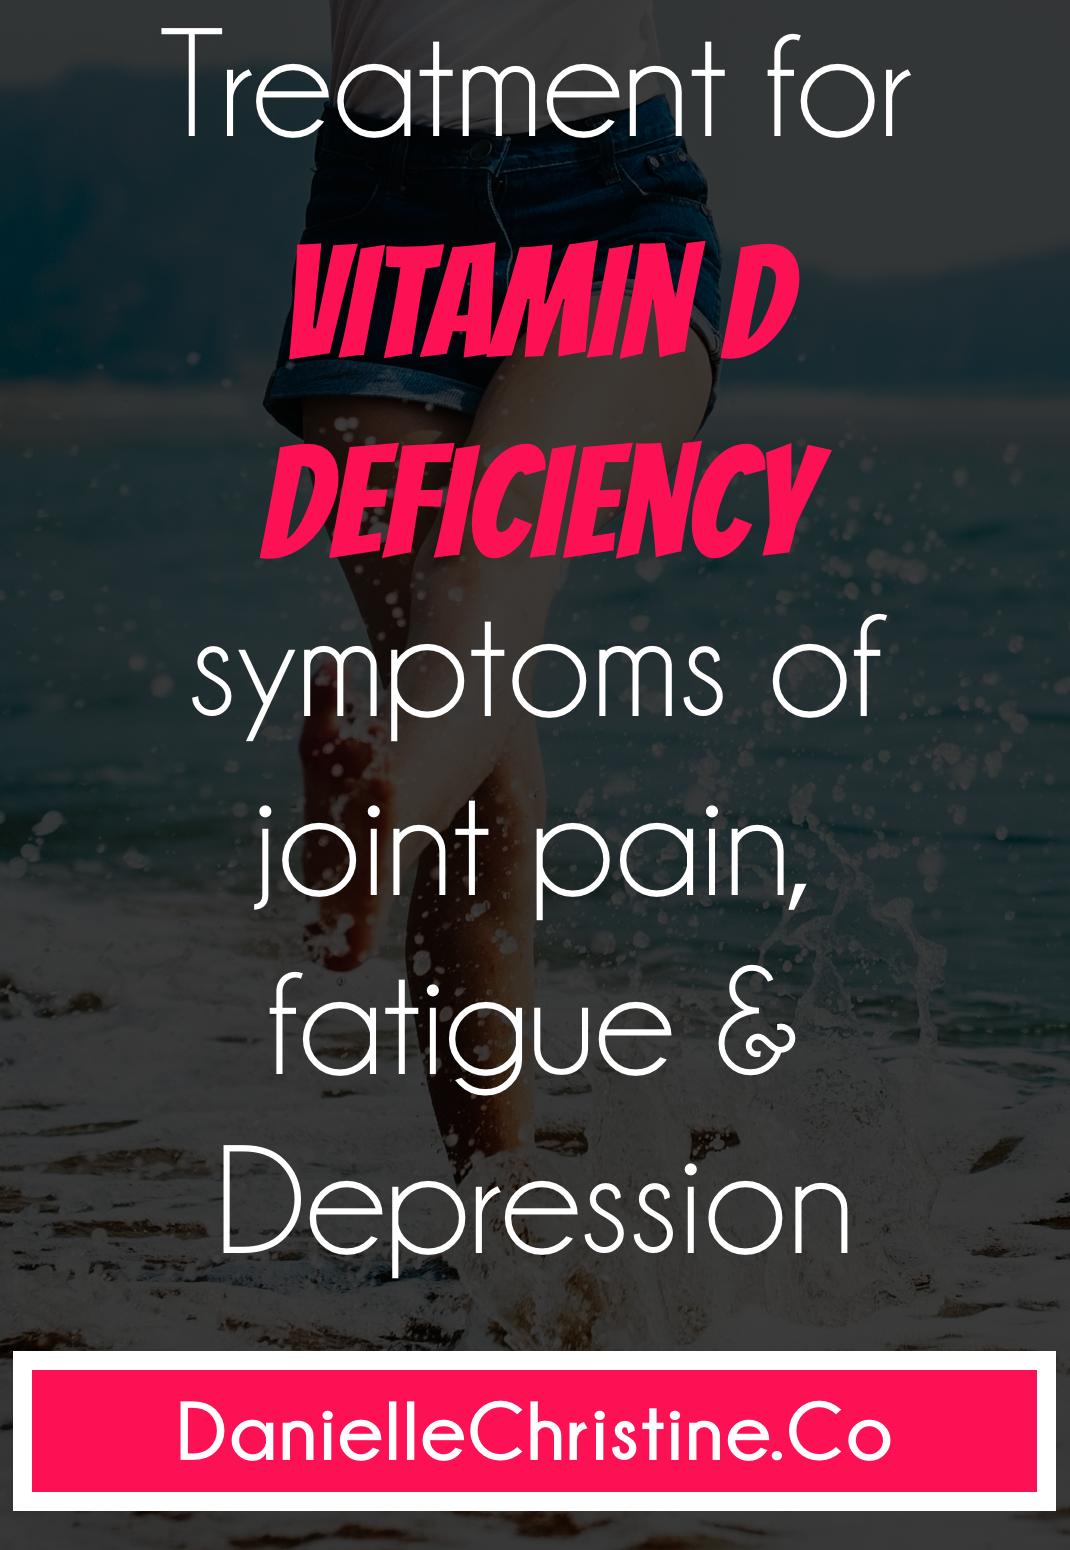 vitamin-d-deficiency-symptoms-fatigue-joint-pain-depression-treatment